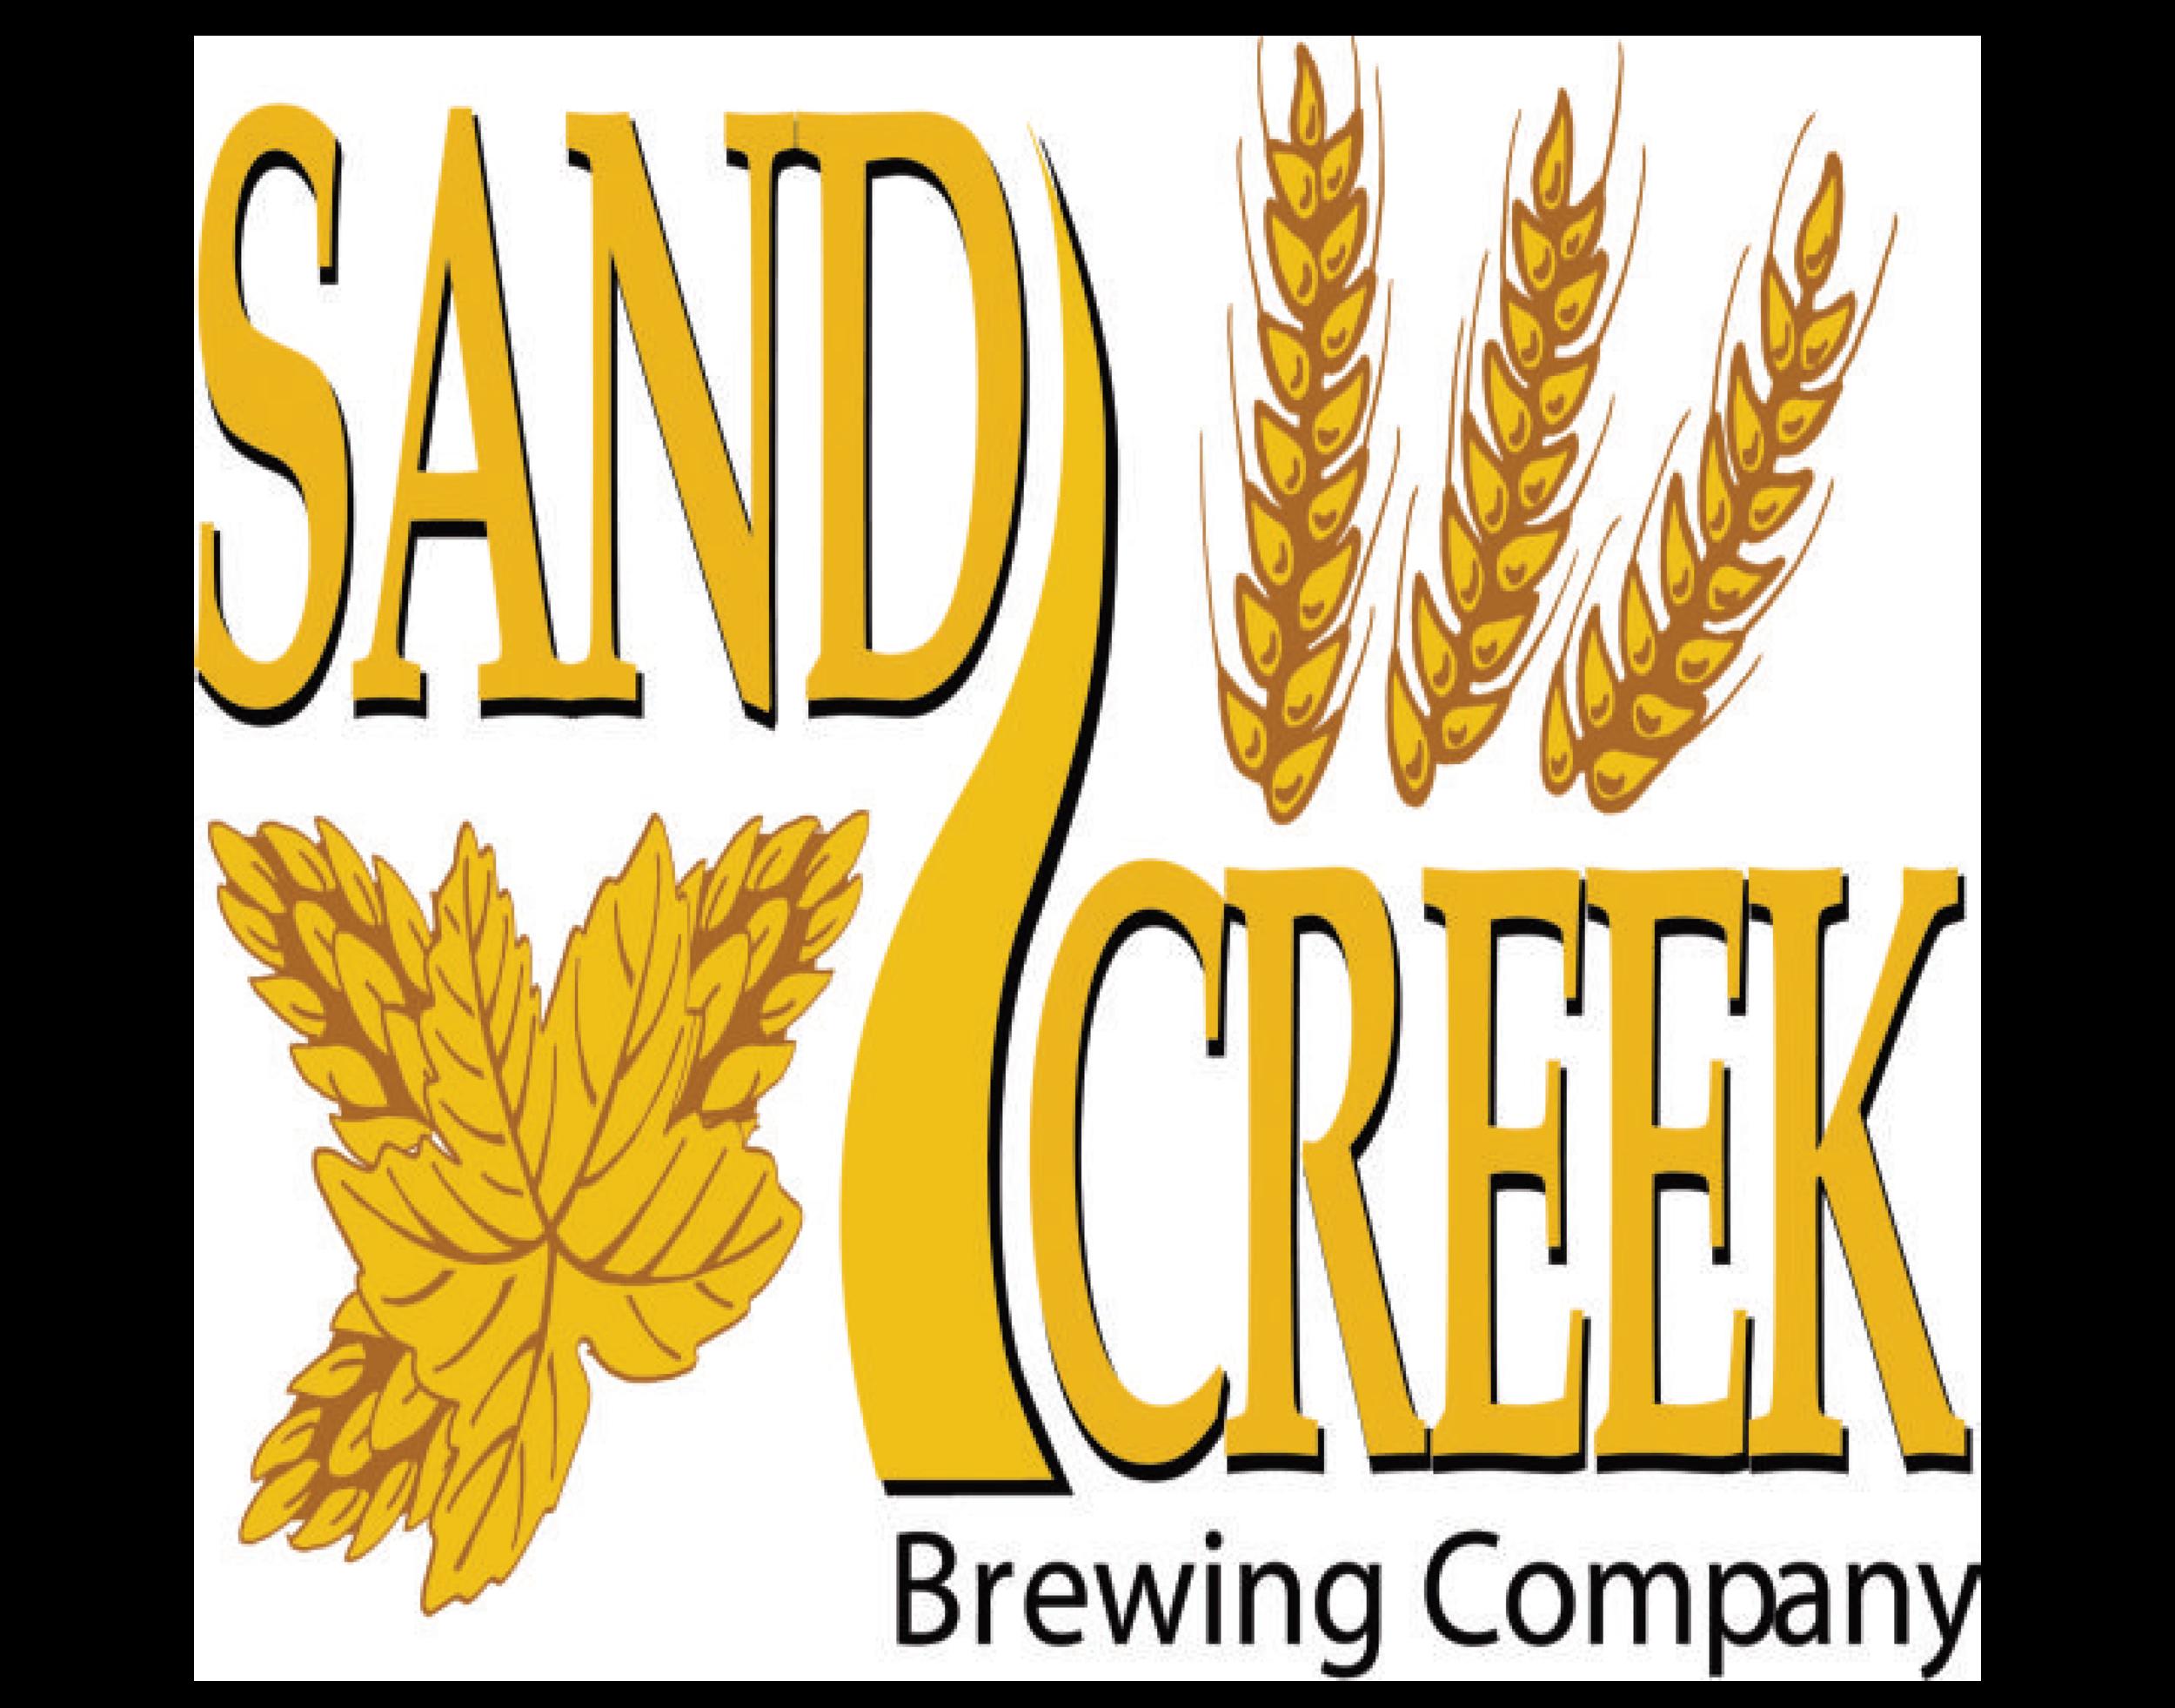 Sand Creek Brewing Company logo. Links to Sand Creek Brewing Company website.